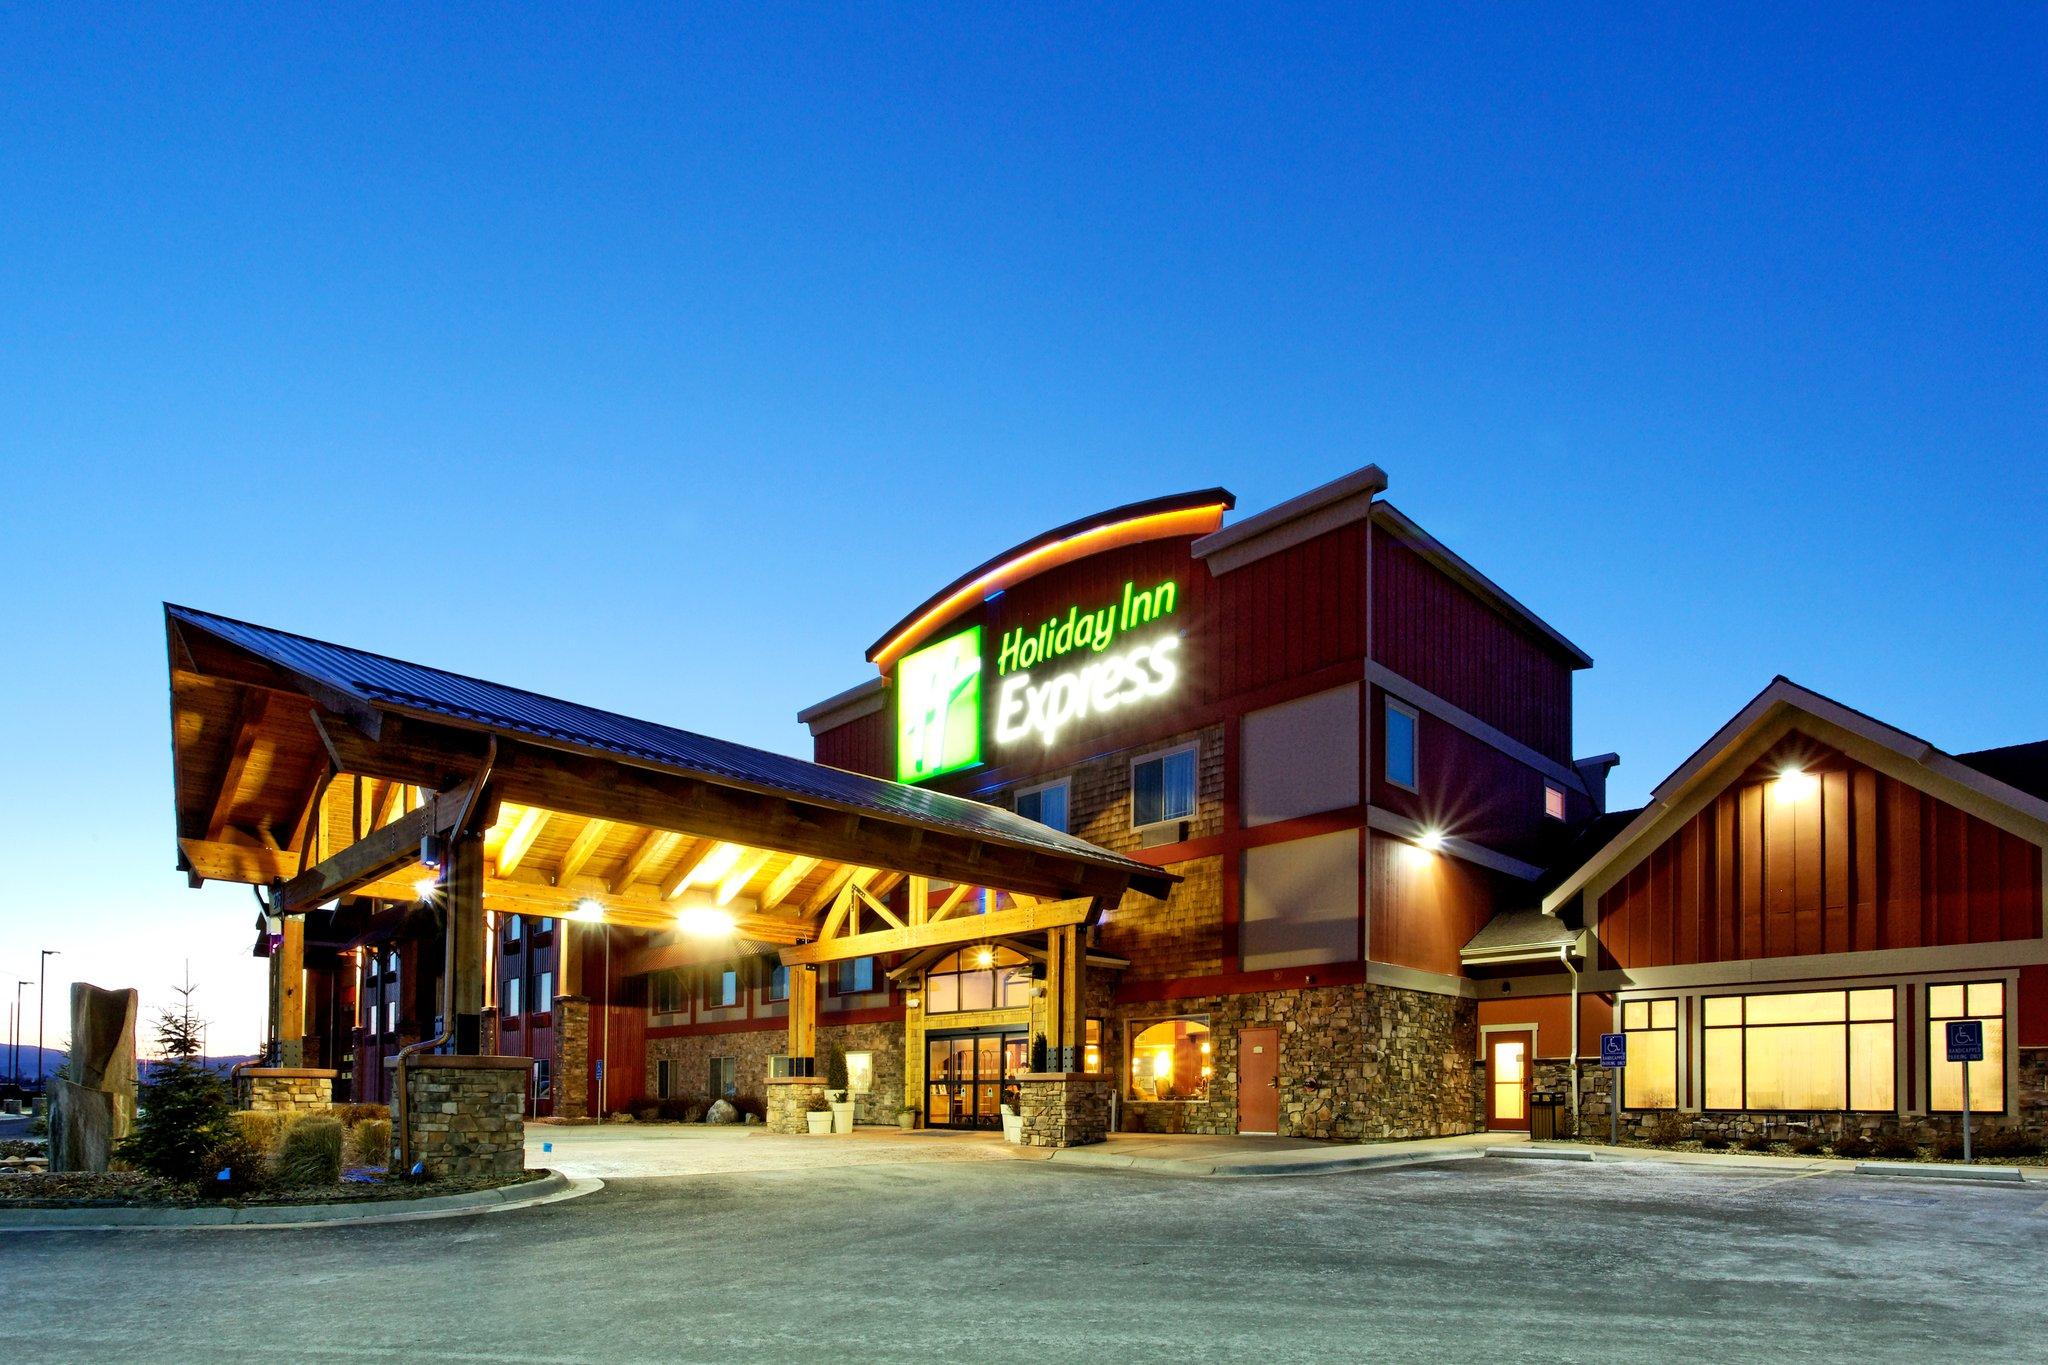 Holiday Inn Express & Suites Kalispell